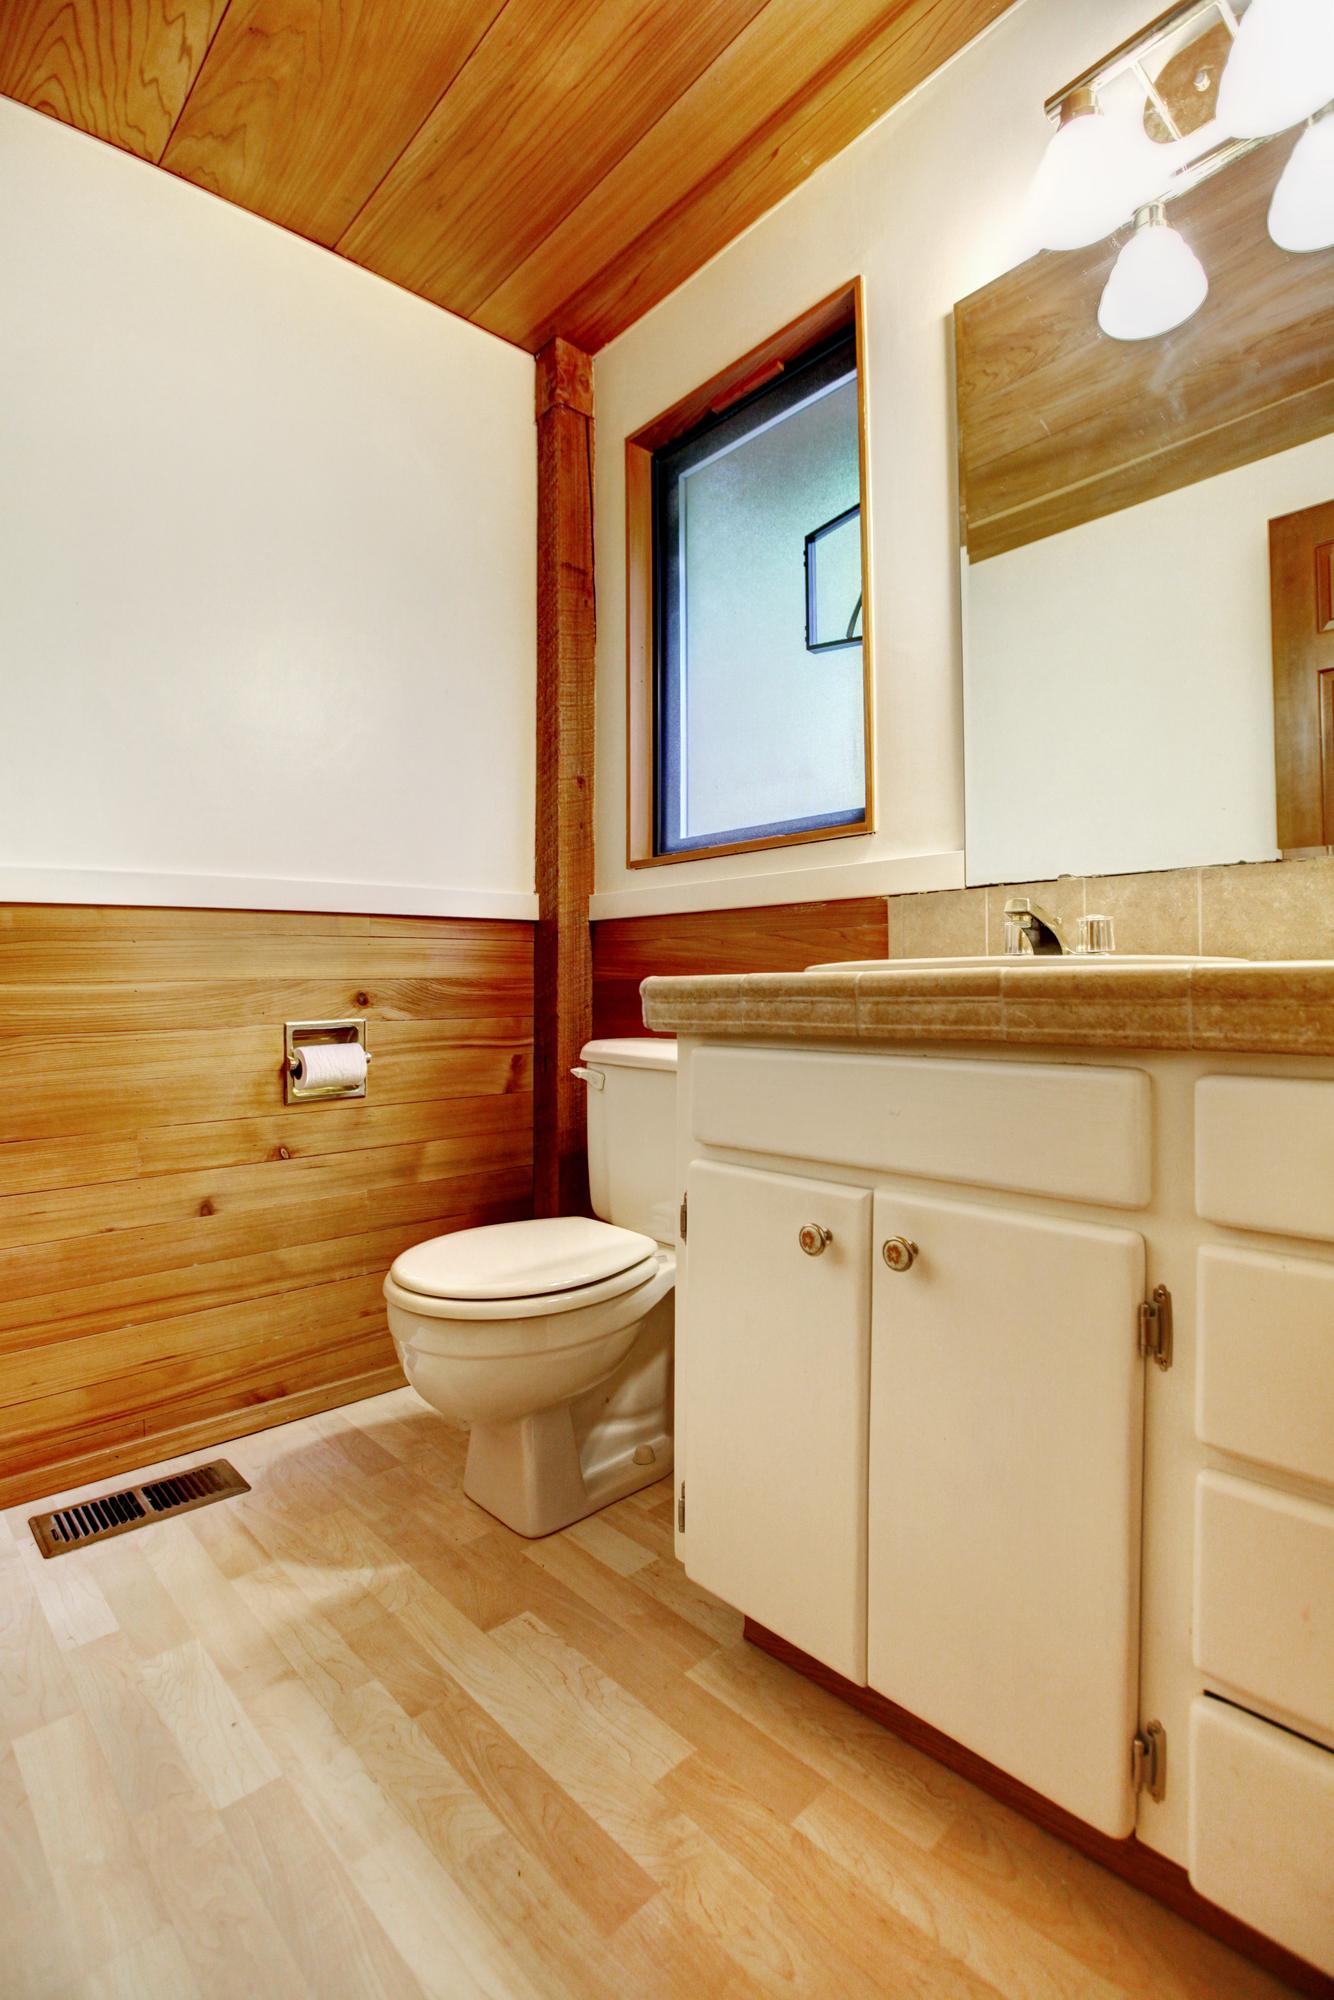 5 tile trends for your bathroom remodeling project bora inc ewa rh nearsay com Bathroom Remodeling Planner Home Depot Bathroom Remodeling